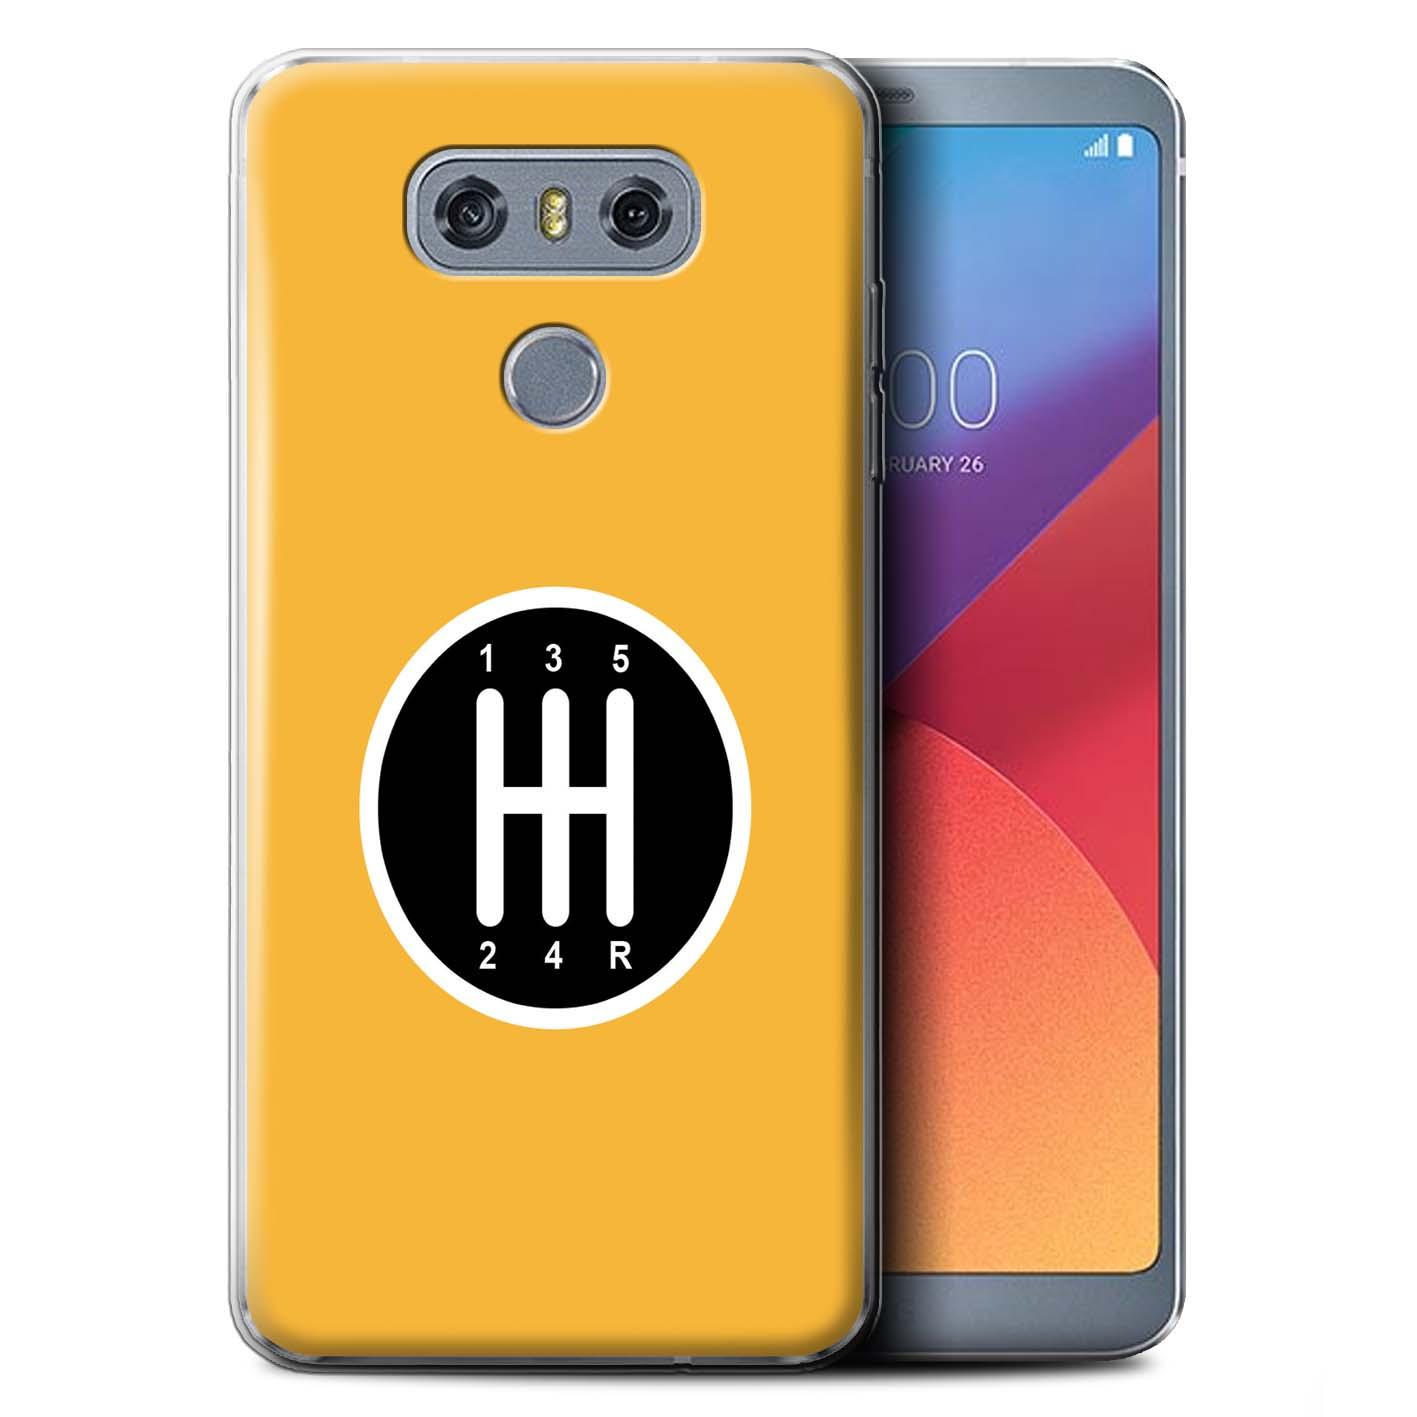 For LG G6 H872 H873 LS993 VS998 / G6 Plus TPU Silicone Gel